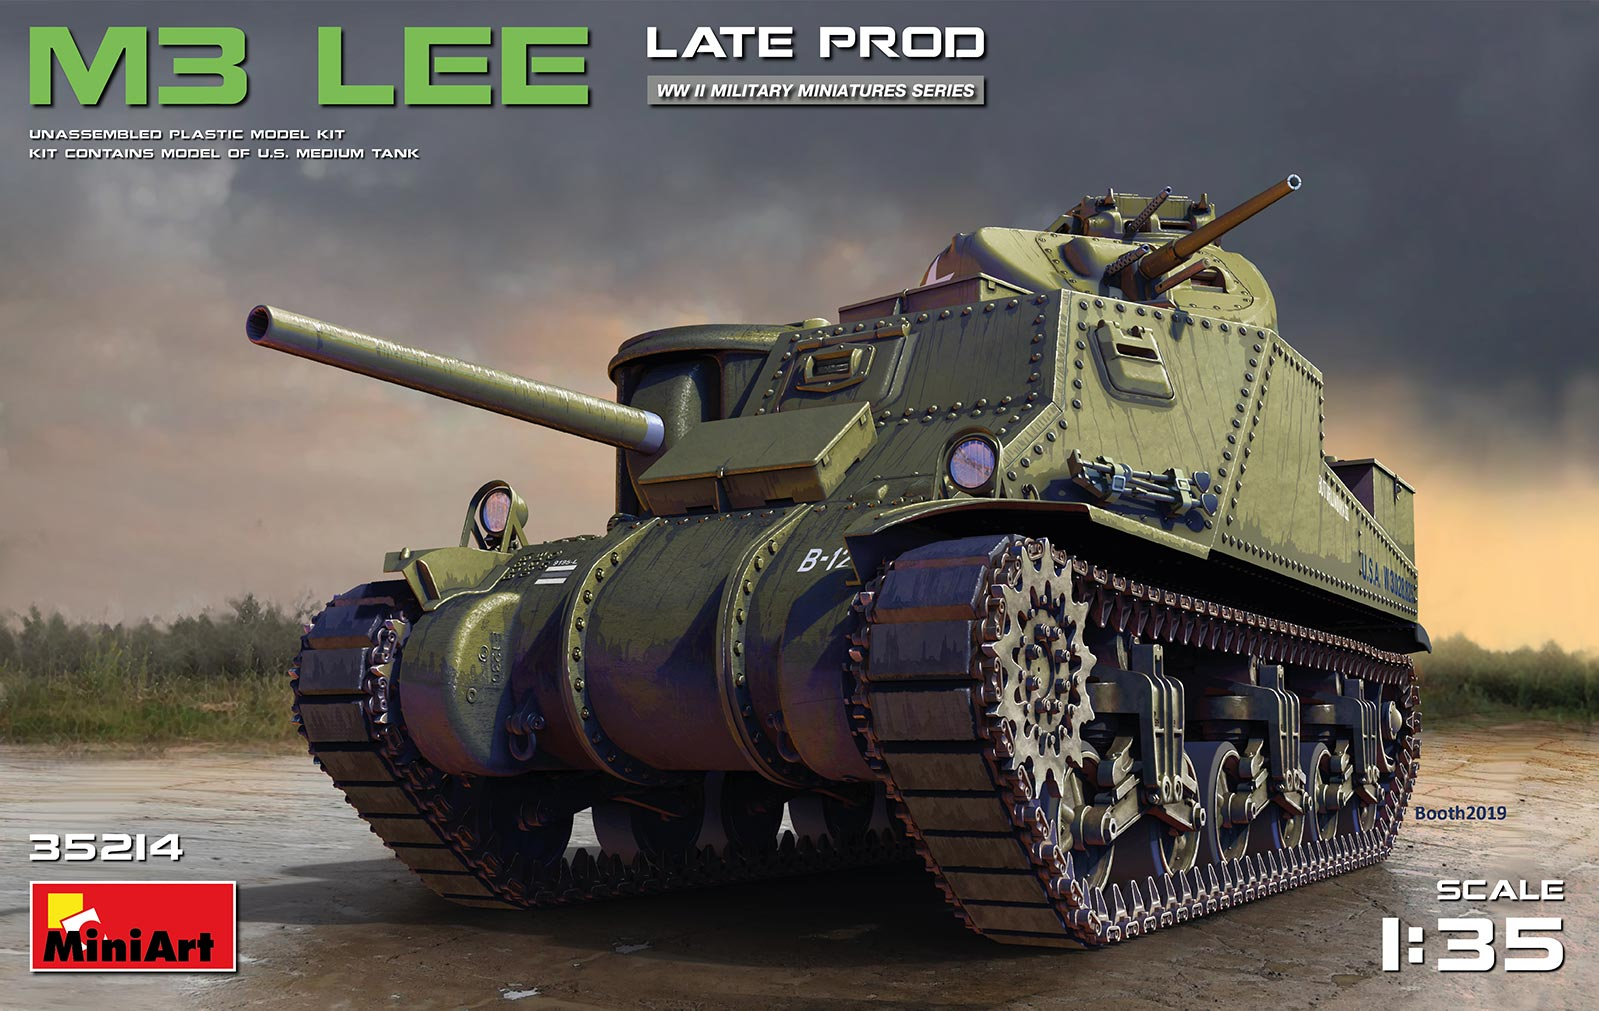 1/35 M3 LEE LATE PROD. 35214